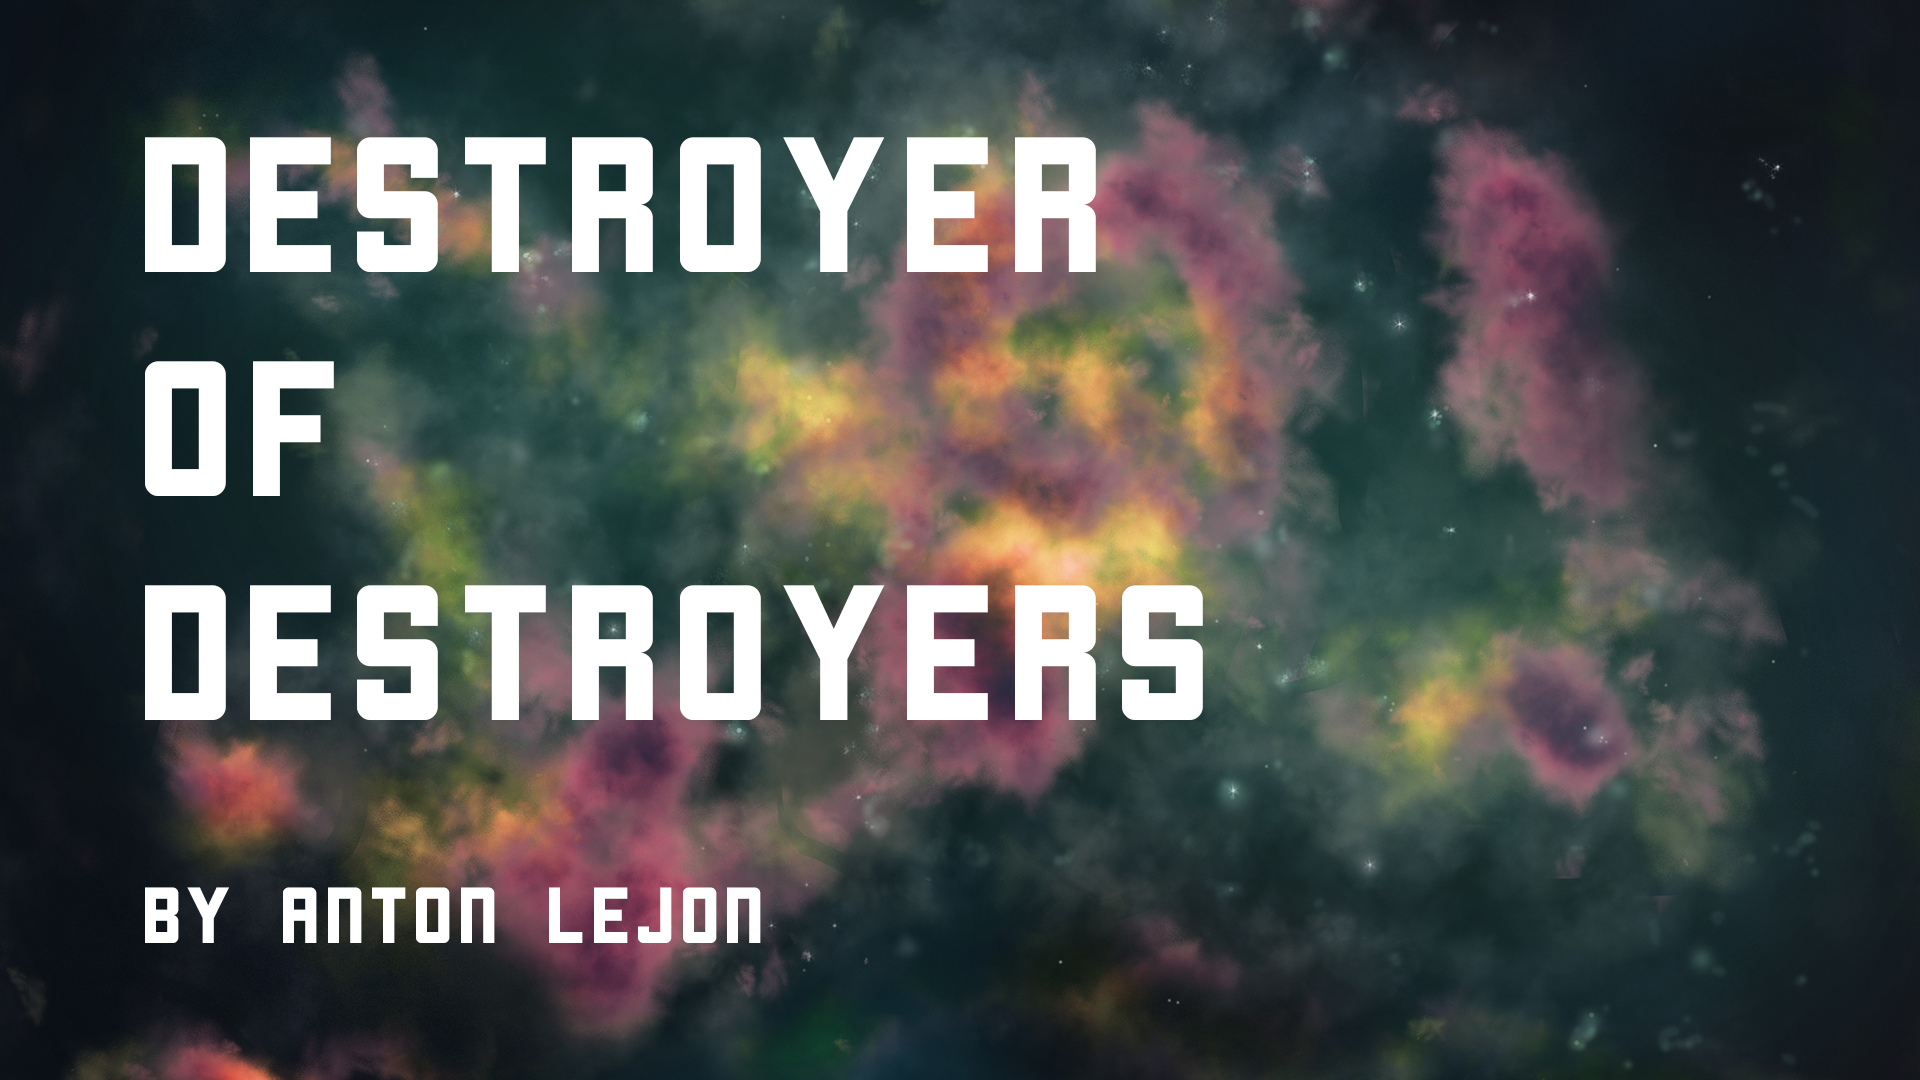 Destroyer of Destroyers